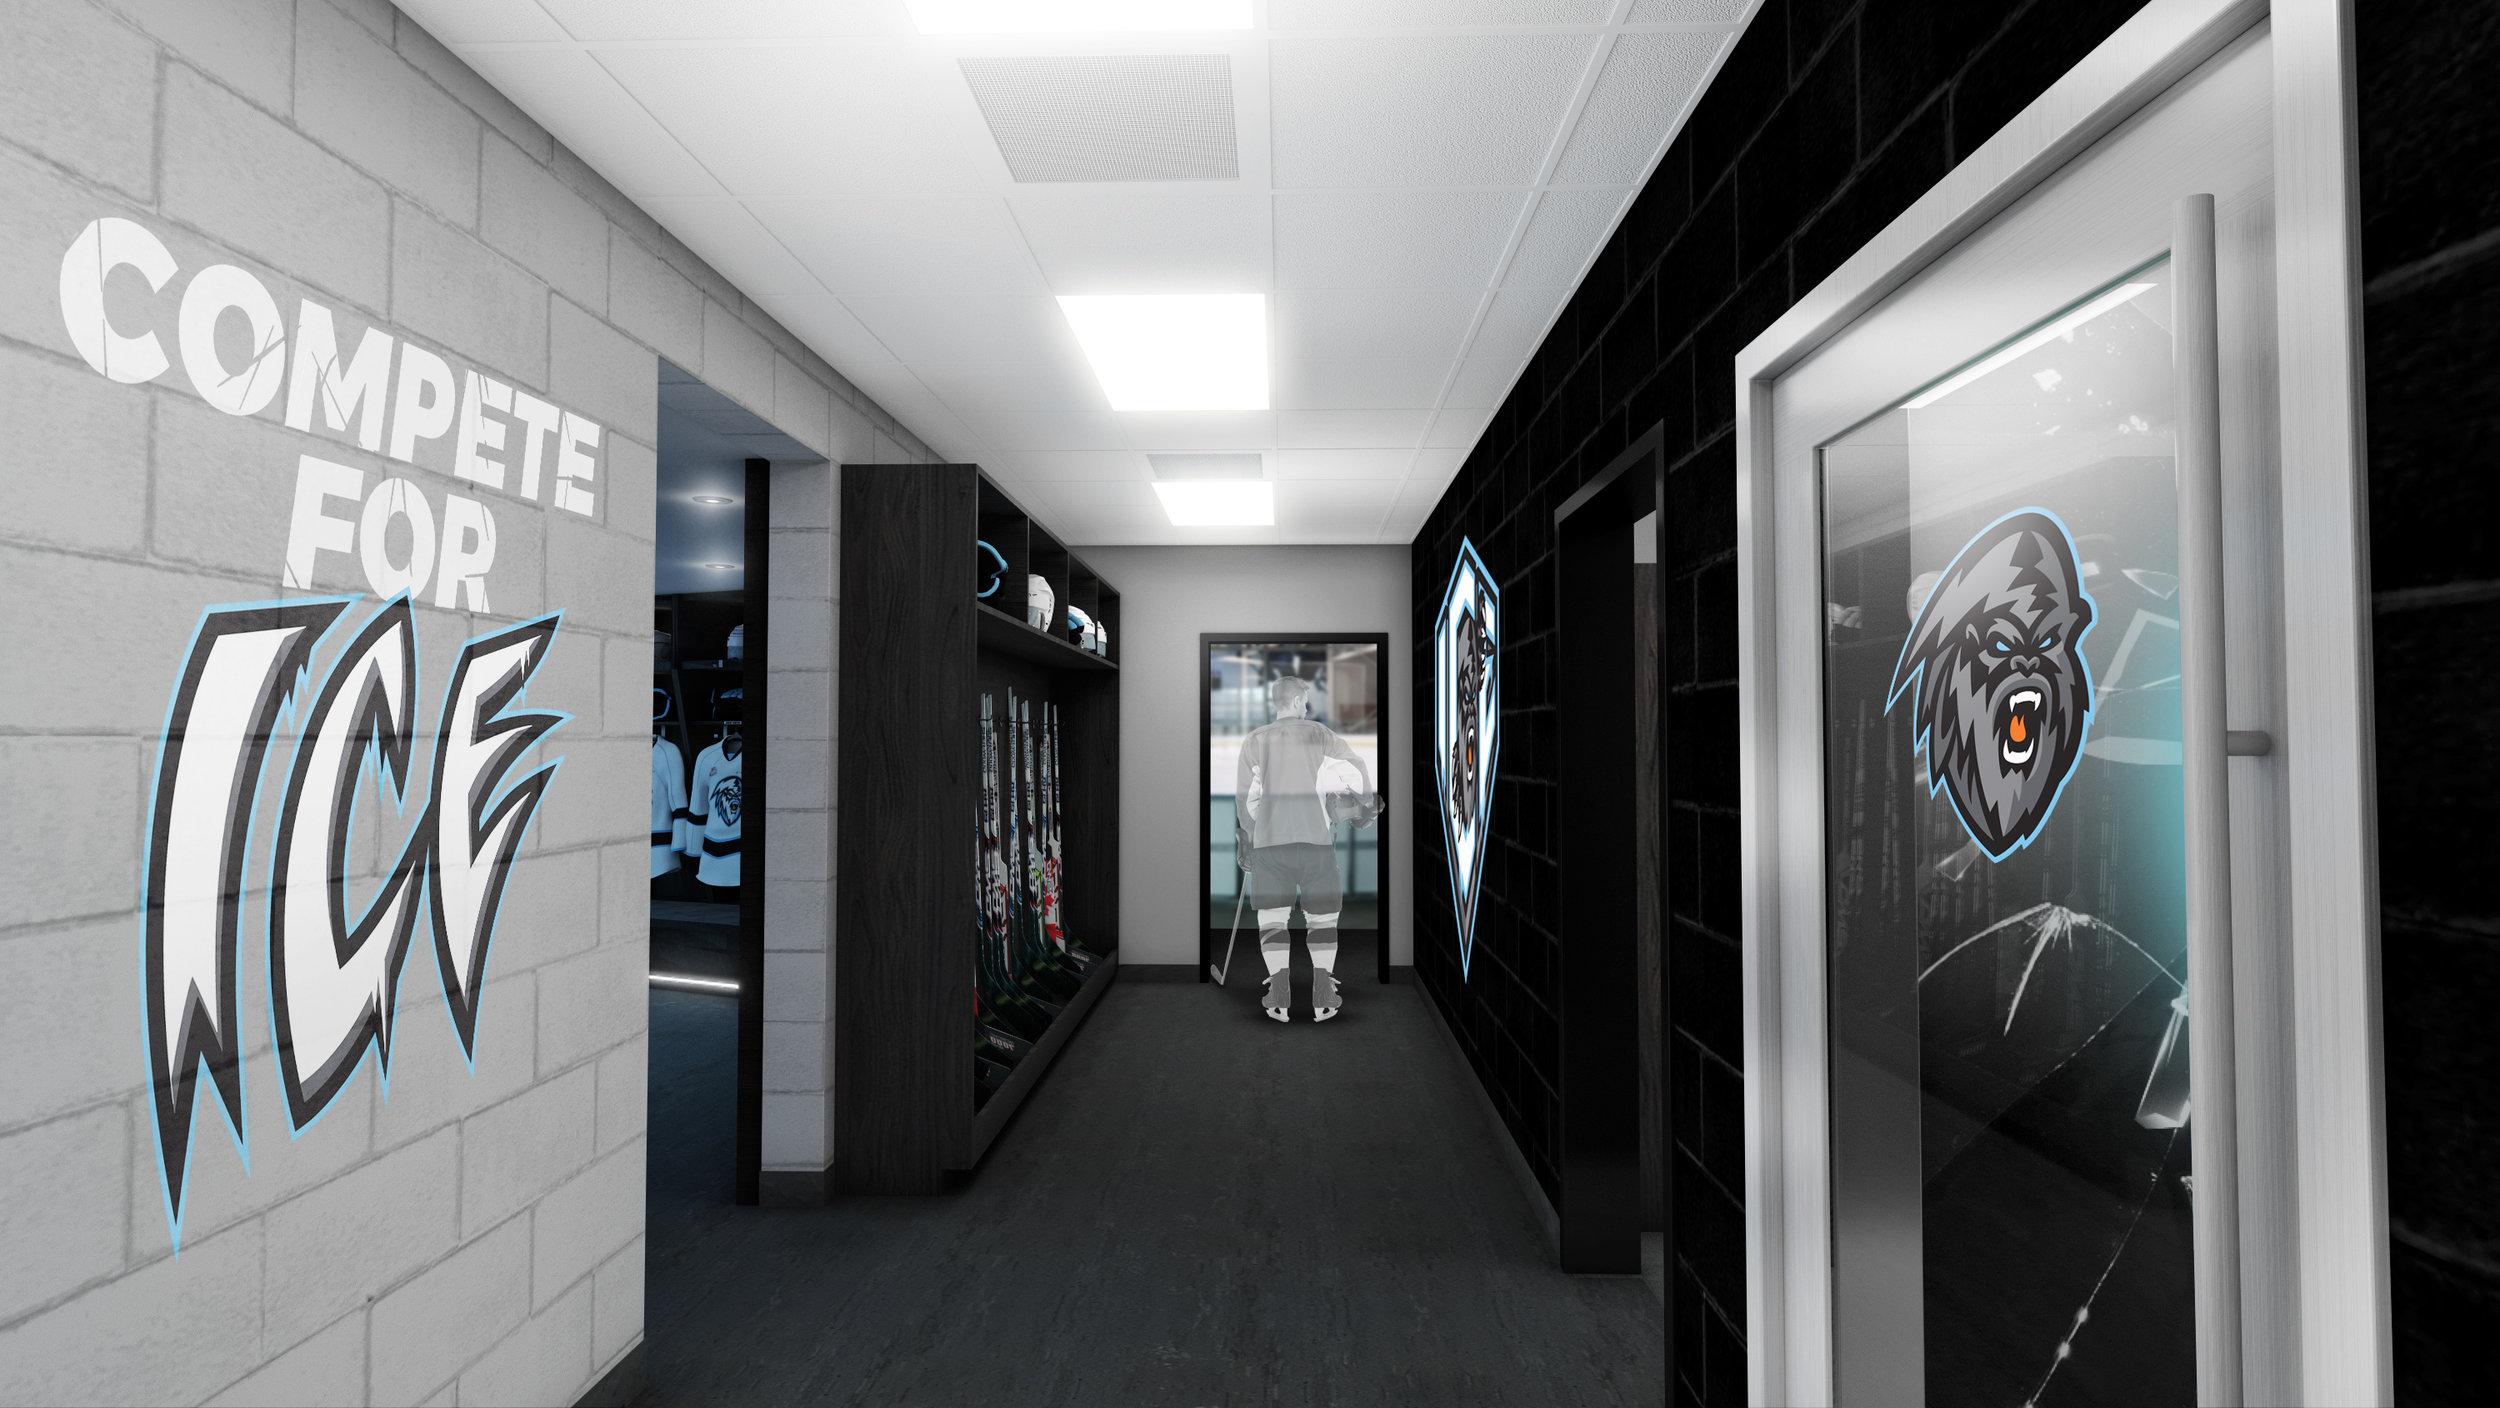 The Rink - Club Corridor - 09112018.jpg